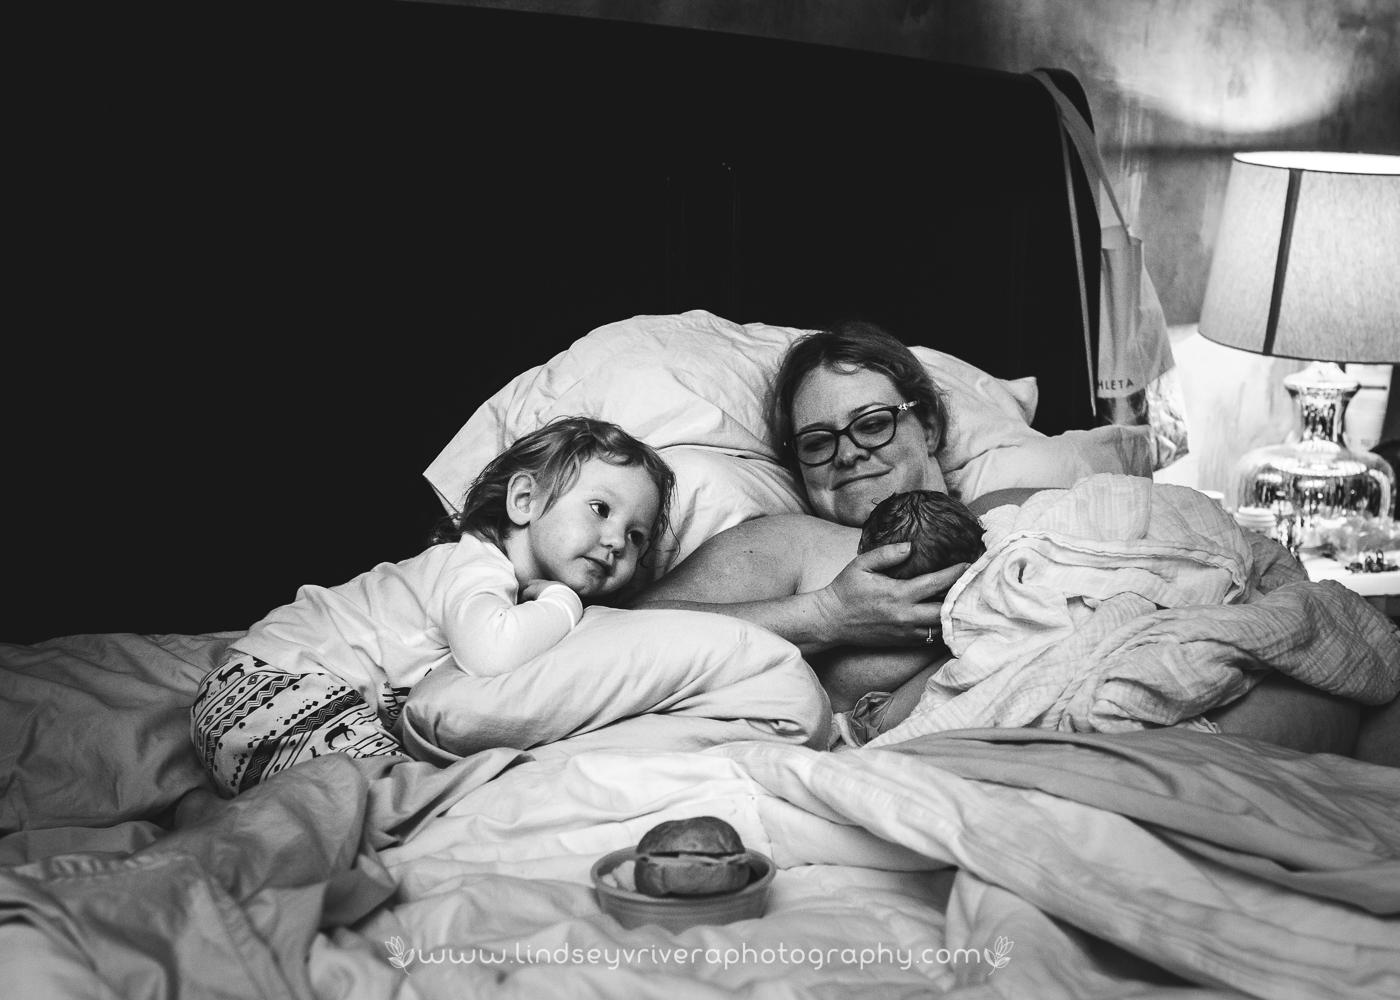 Home-Birth-Born-Photography-Salt-Lake-City,-Wasatch-Midwifery-&-Wellness,-Just-Born40.jpg